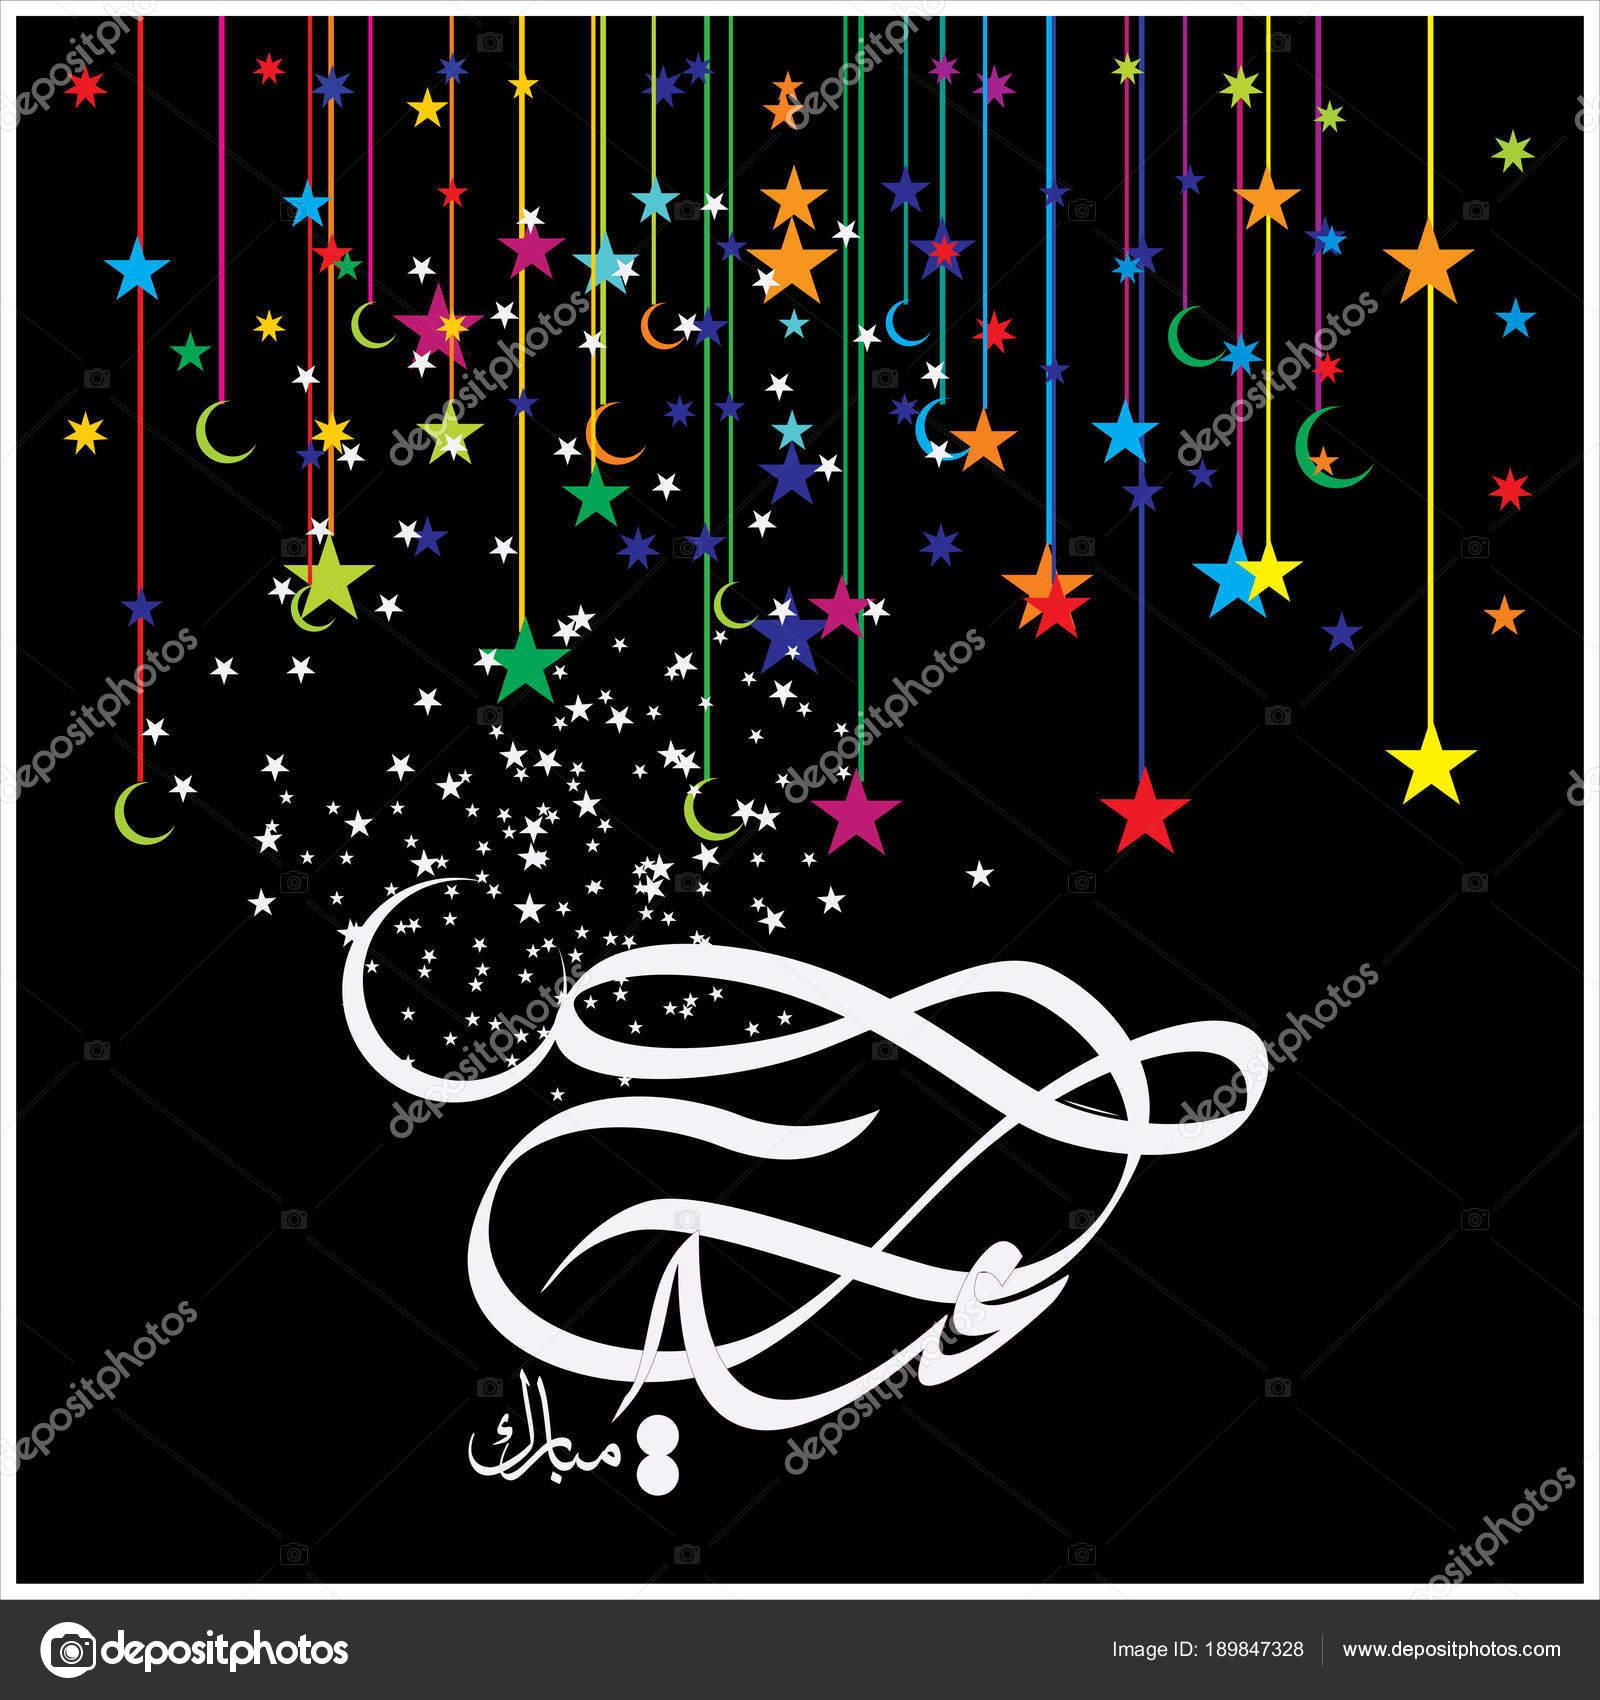 Happy eid mubarak arabic calligraphy greeting card muslim happy eid mubarak arabic calligraphy greeting card muslim celebrating festival stock photo m4hsunfo